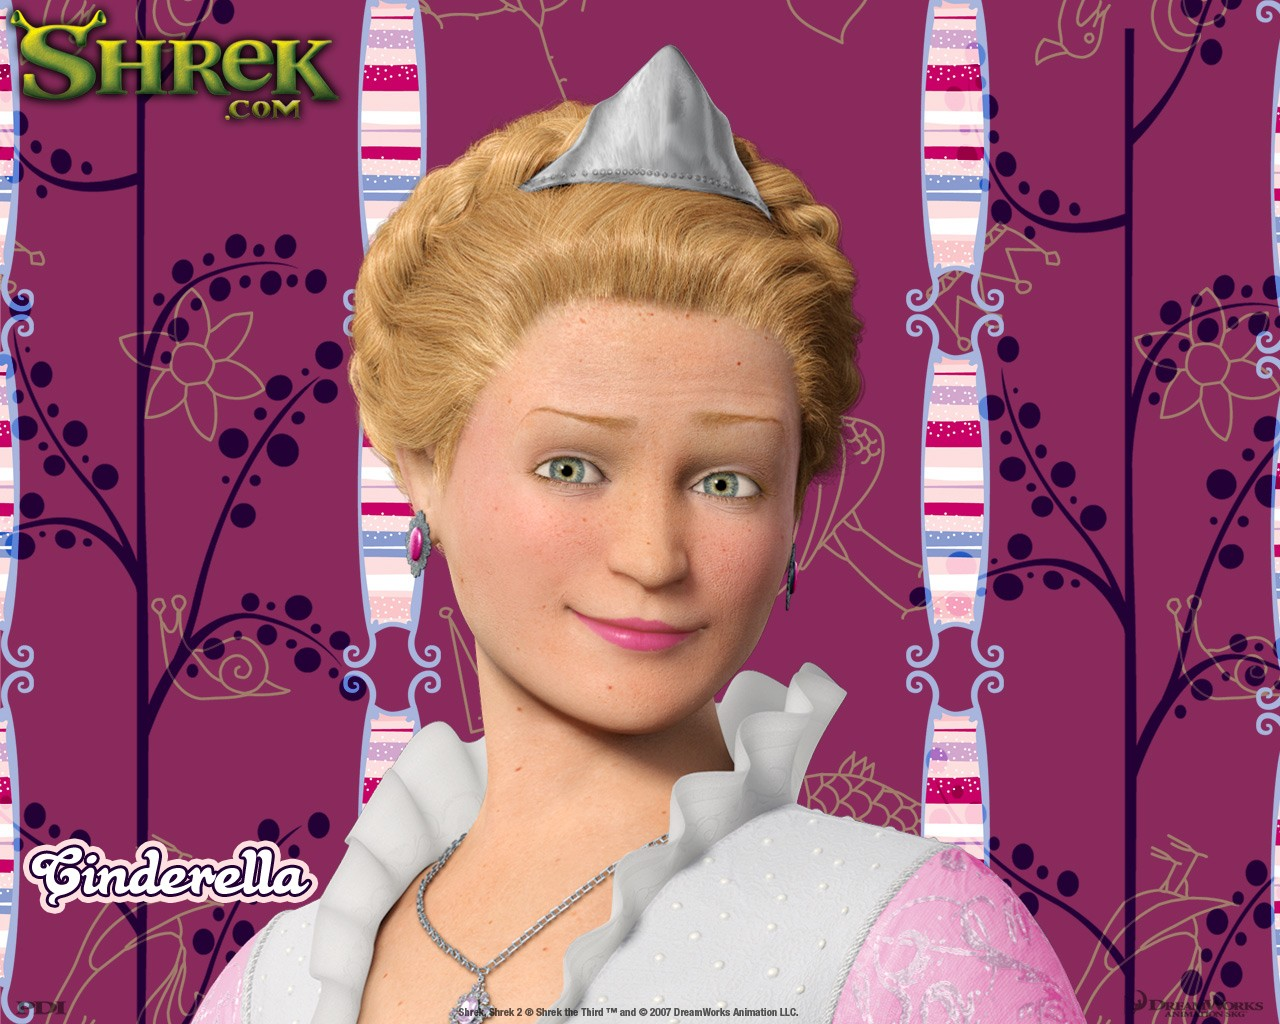 Un wallpaper di Cenerentola(Cinderella) per il film 'Shrek Terzo'